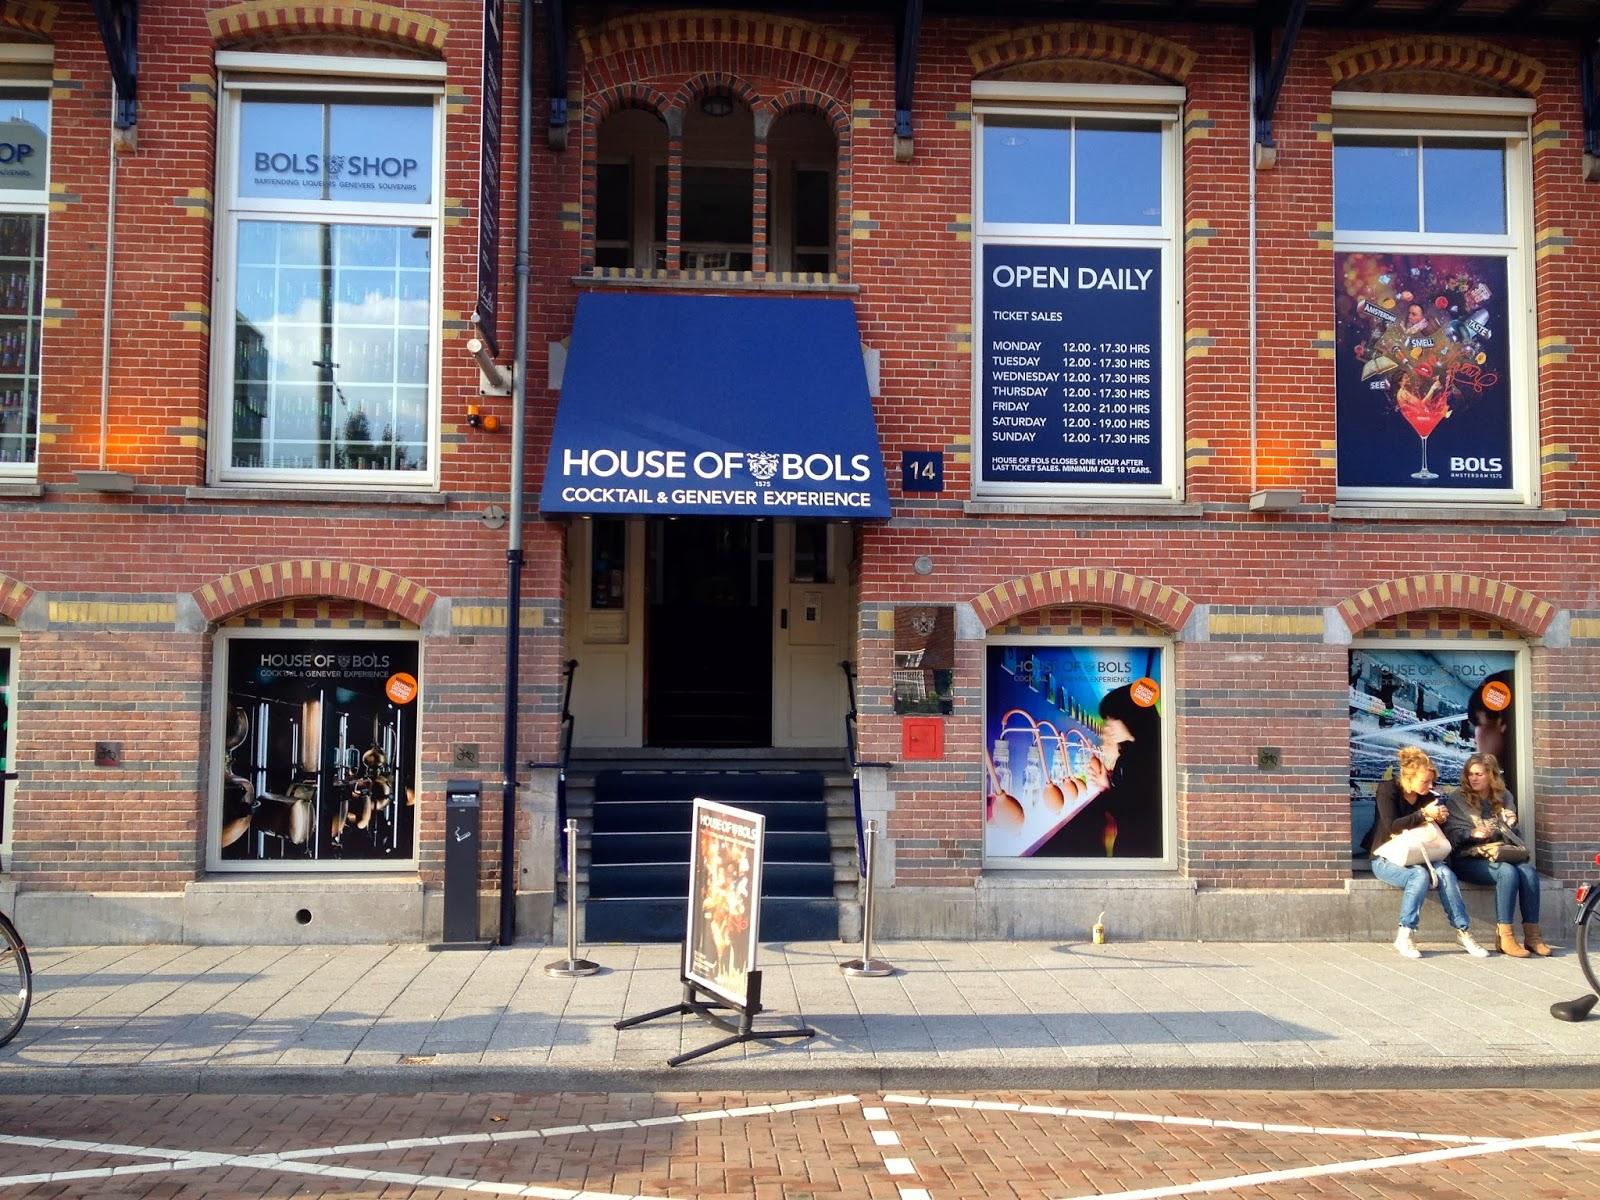 Amsterdam Museum Quarter Museumnacht